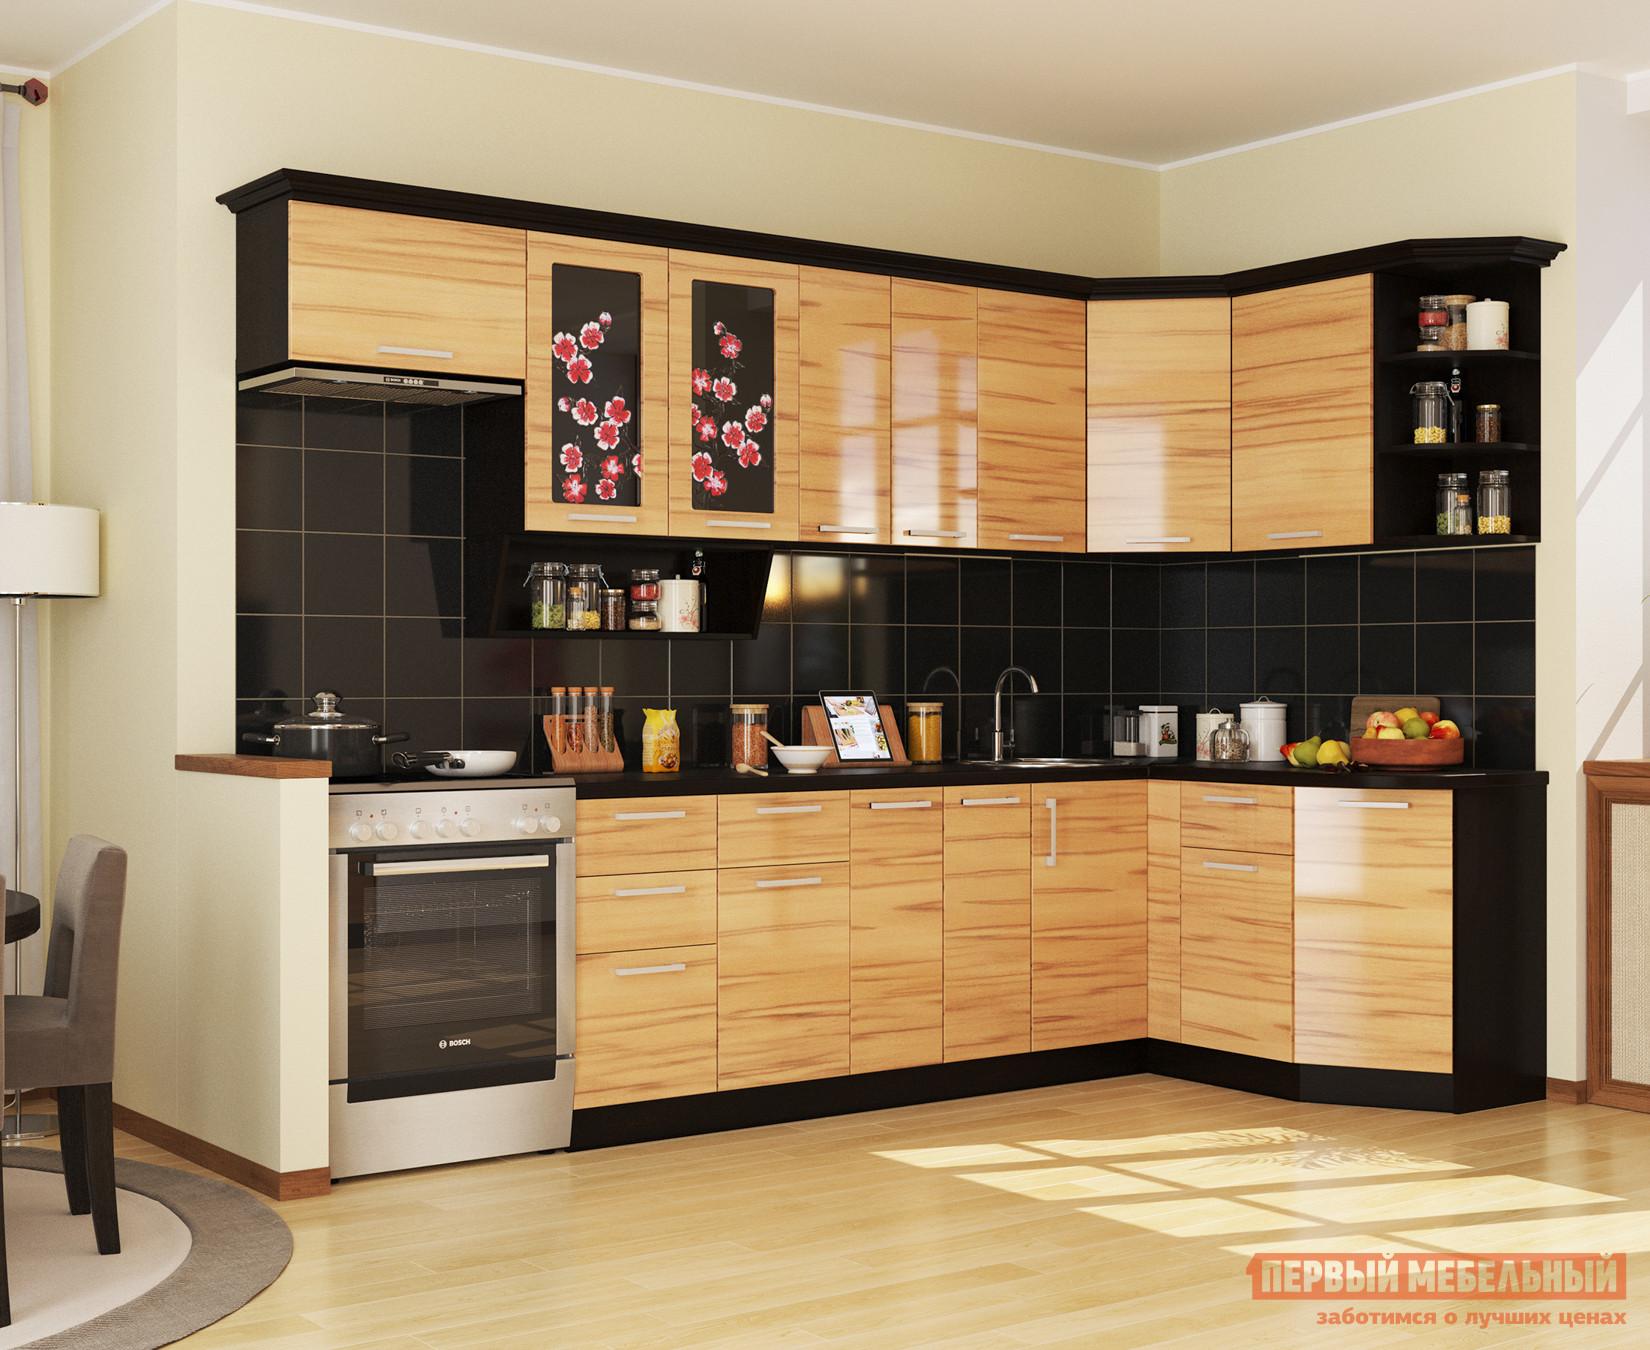 Кухонный гарнитур МО РОСТ Сакура Угол 4 кухонный гарнитур трия фэнтези 120 см